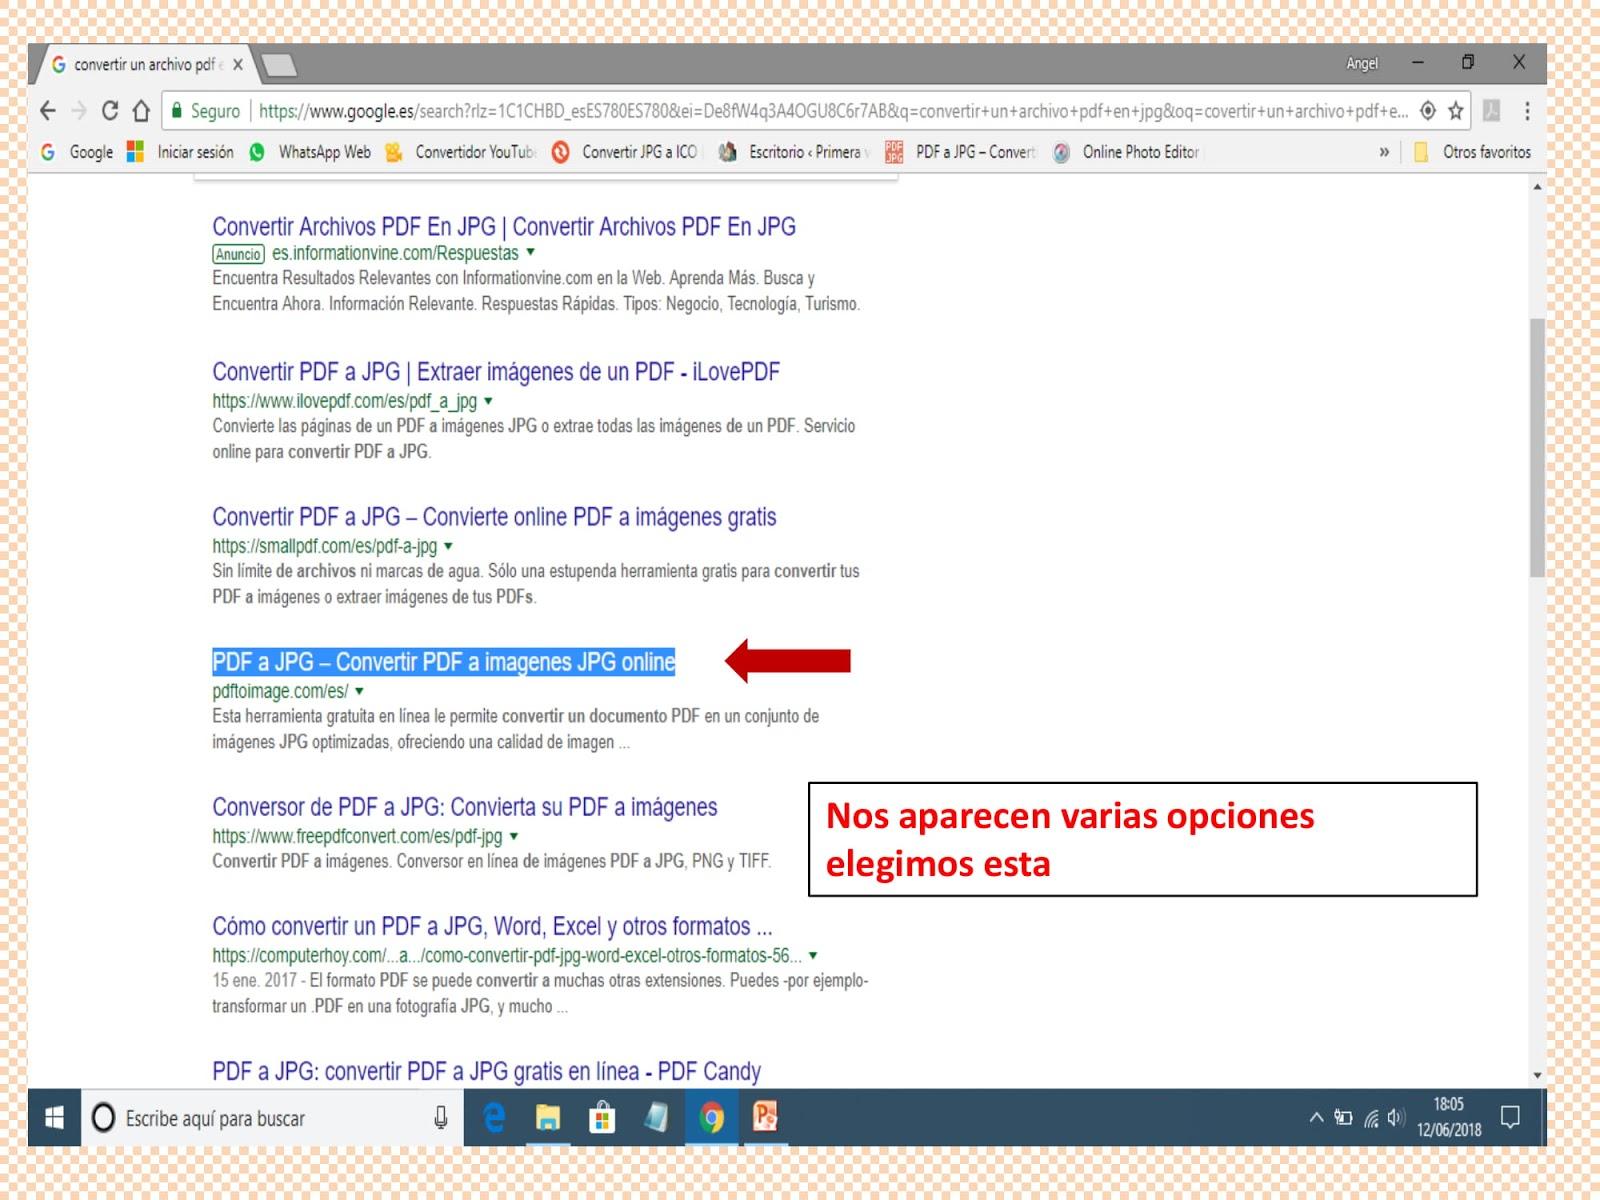 convertir un archivo pdf a jpg en linea